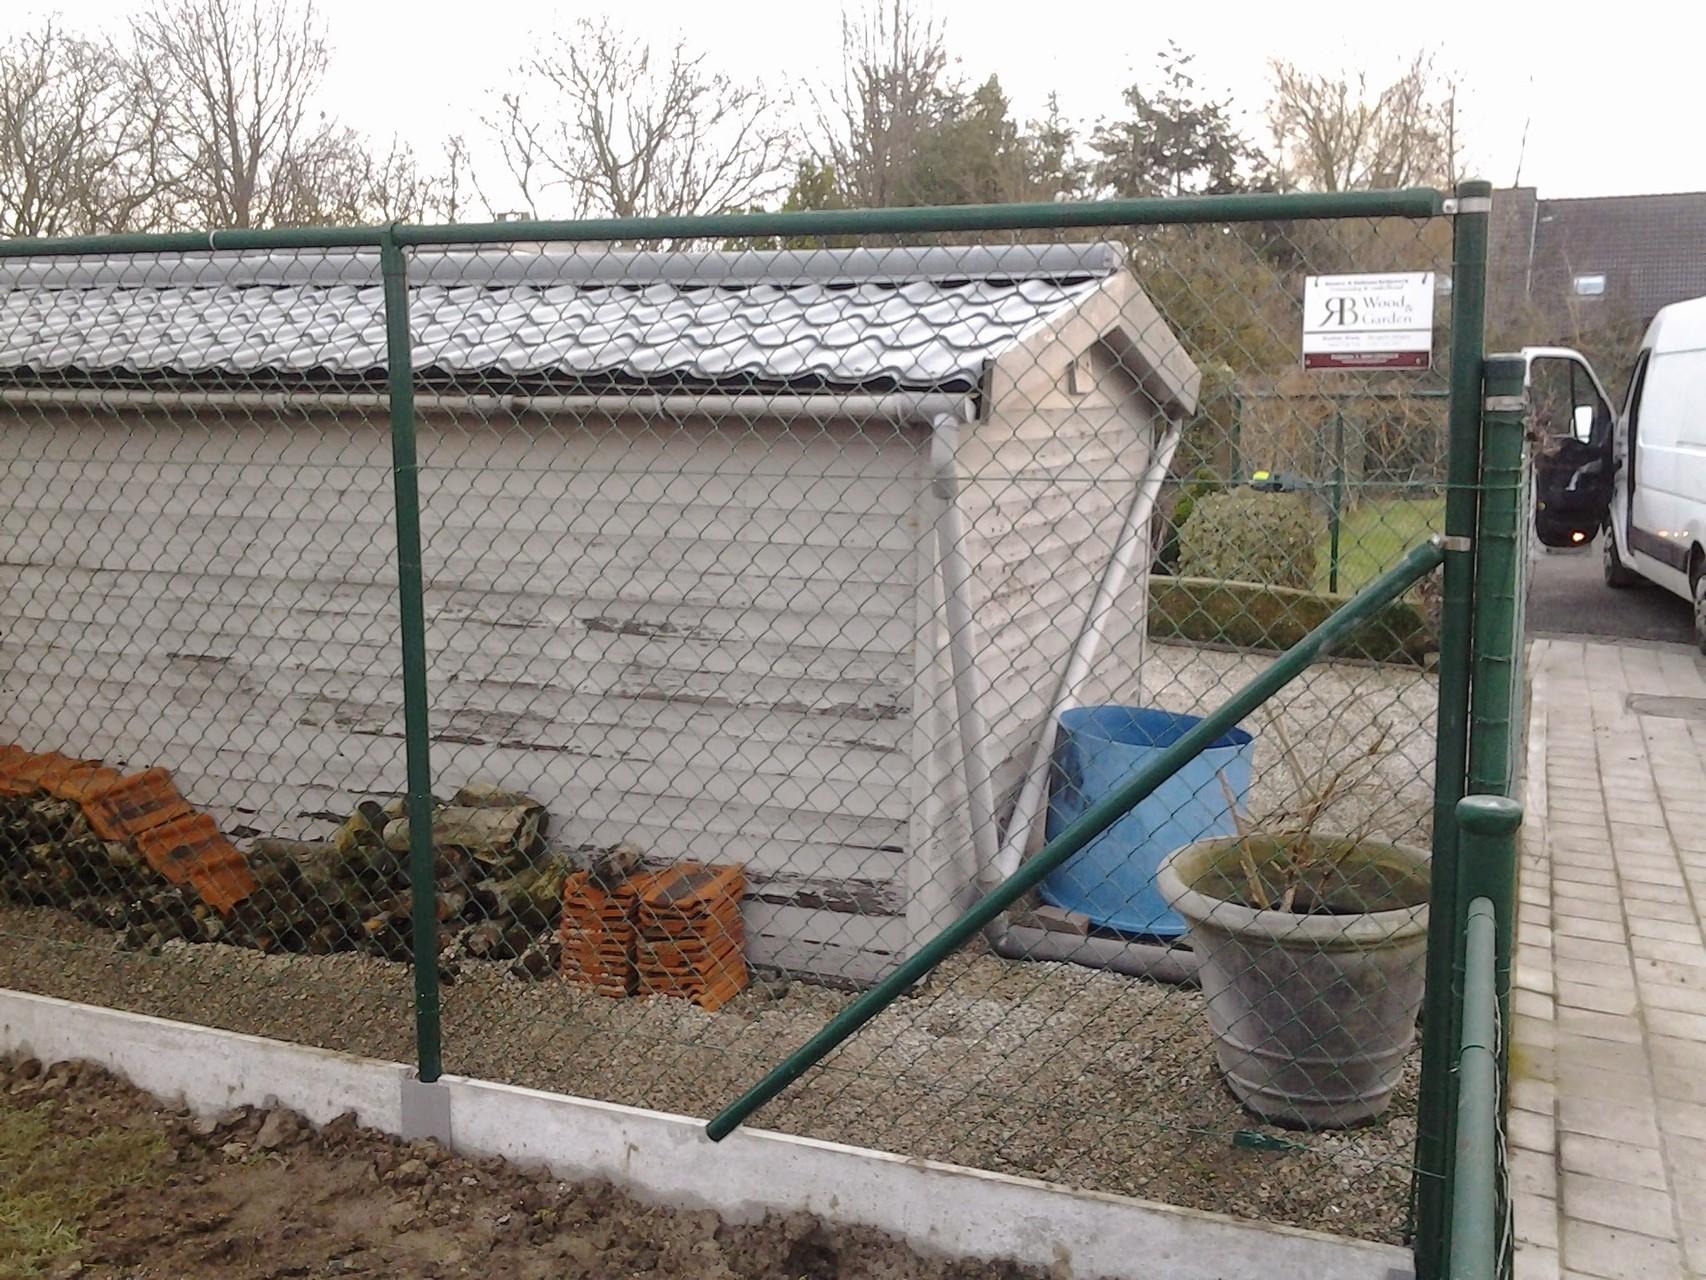 afsluiting oprit tuinhuis terras tuinhuis carport. Black Bedroom Furniture Sets. Home Design Ideas